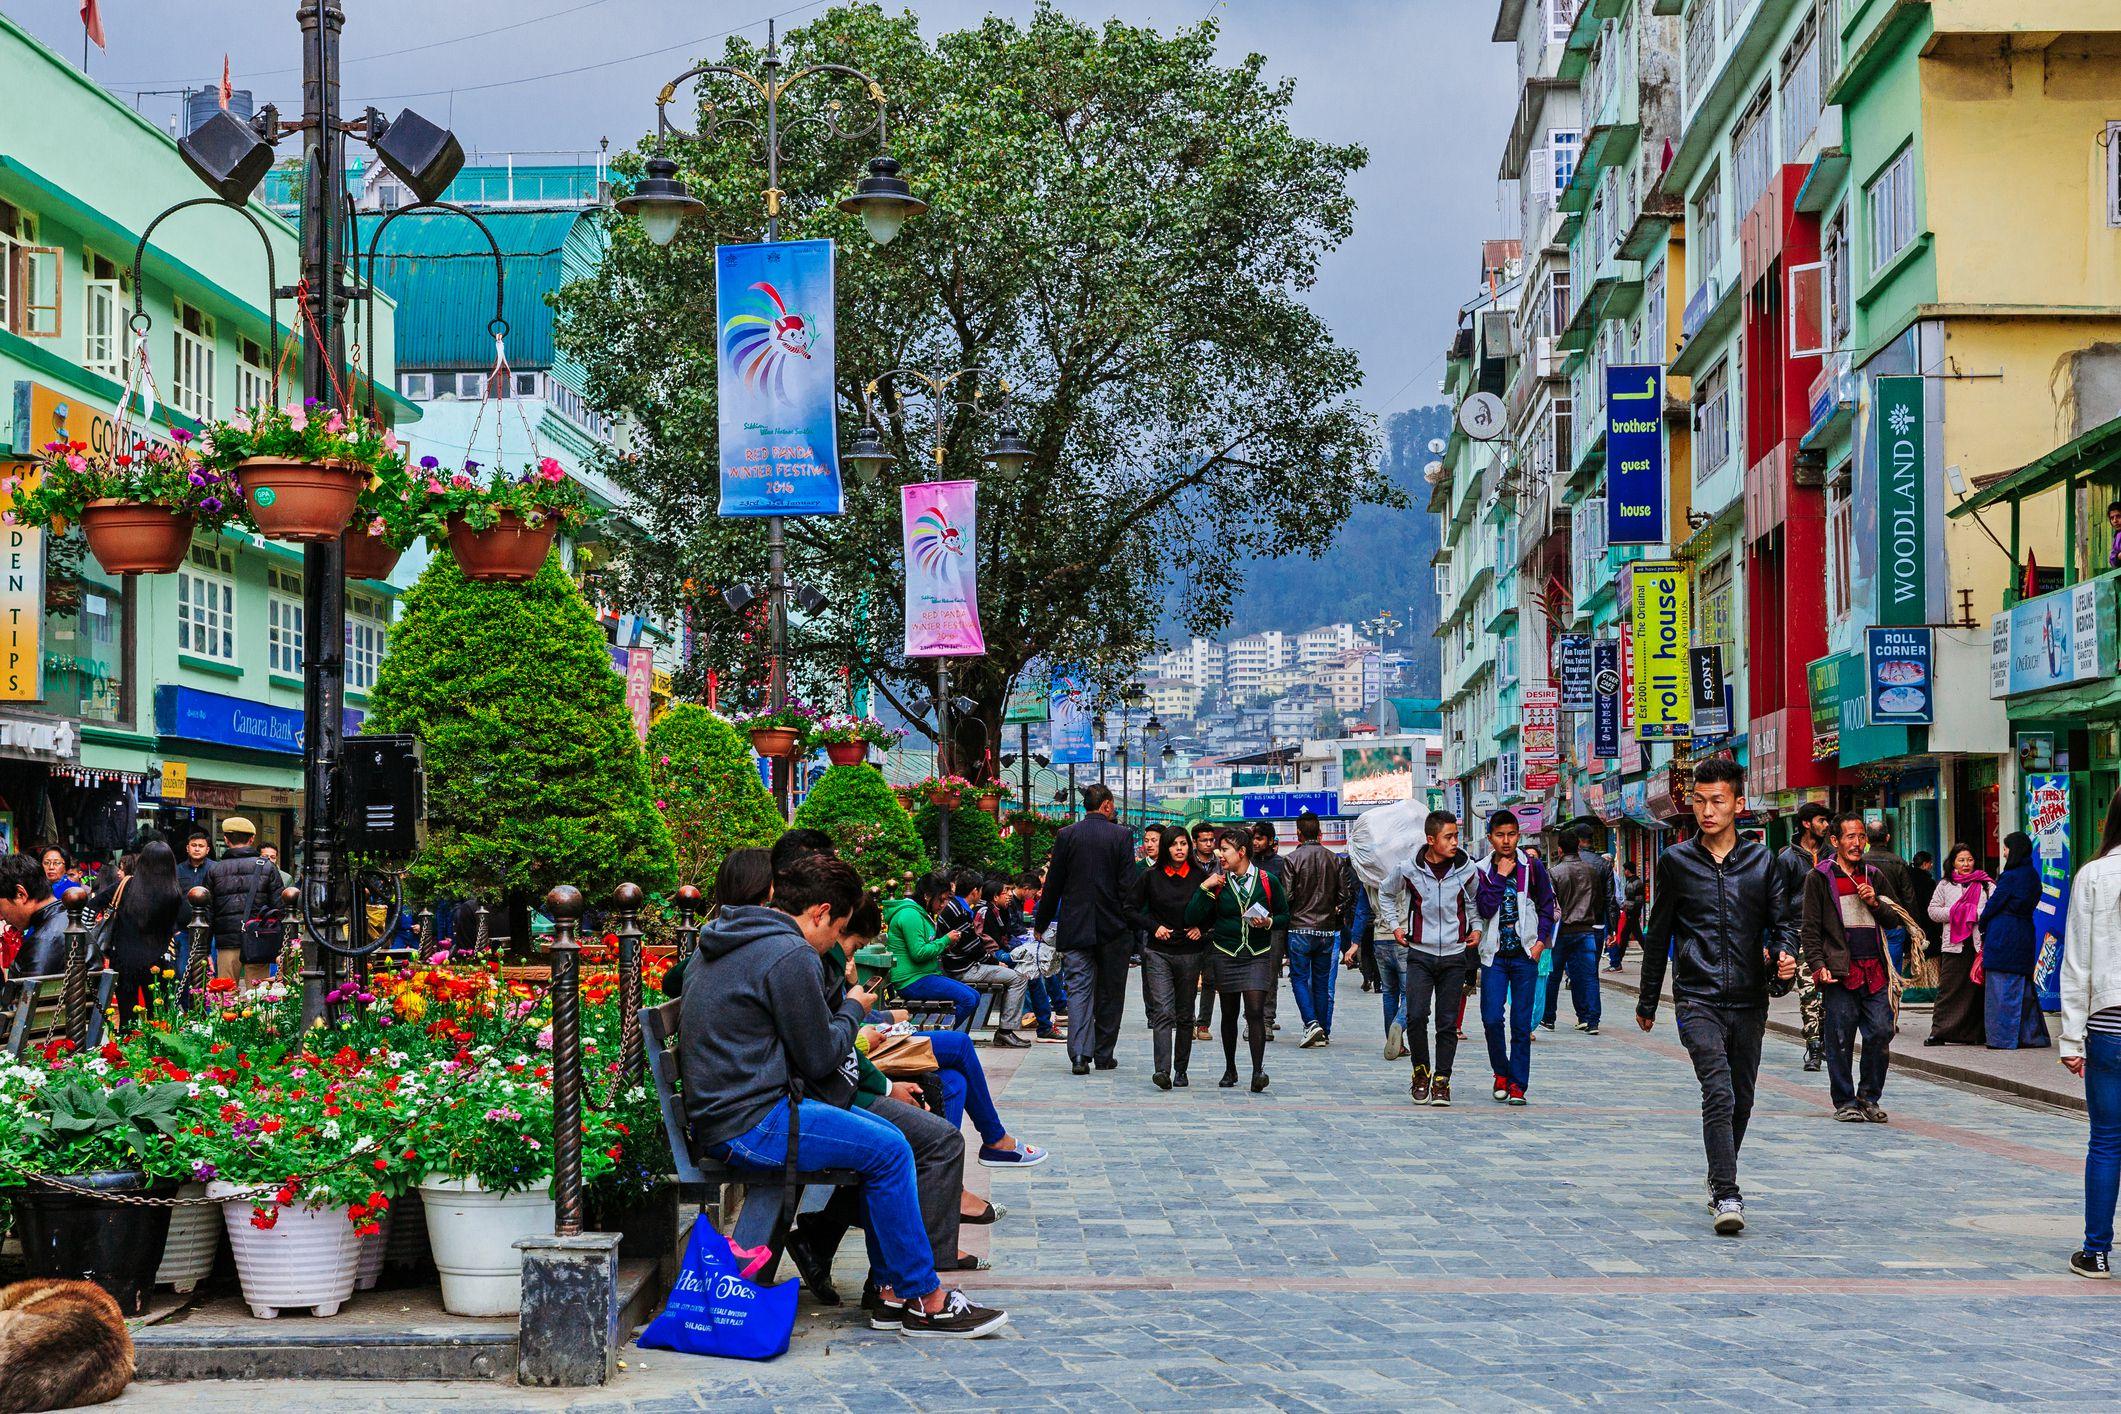 People walkling on MG Road of Gangtok, Sikkim, India